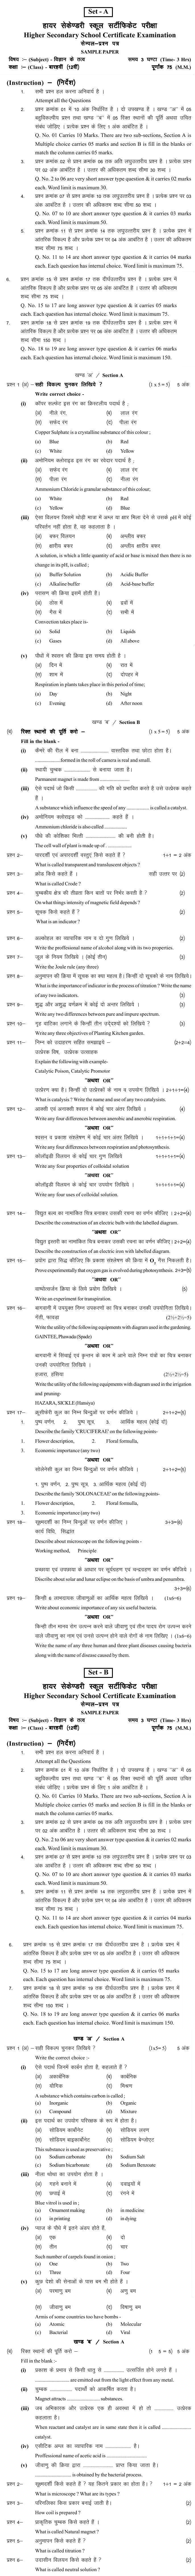 Chattisgarh Board Class 12 Elements of ScienceSample Paper